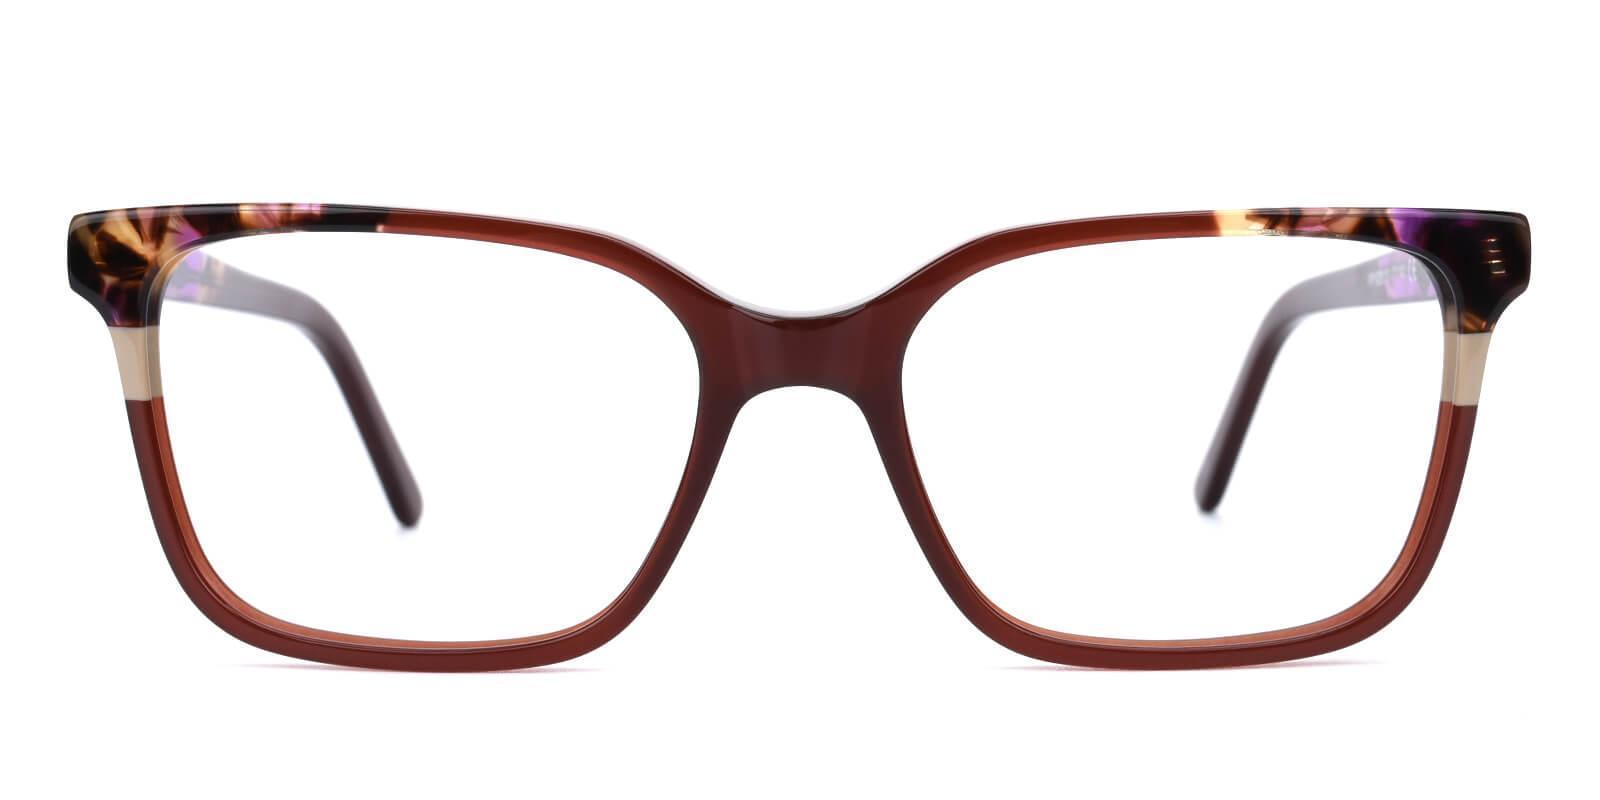 Mars Purple Acetate Eyeglasses , UniversalBridgeFit Frames from ABBE Glasses